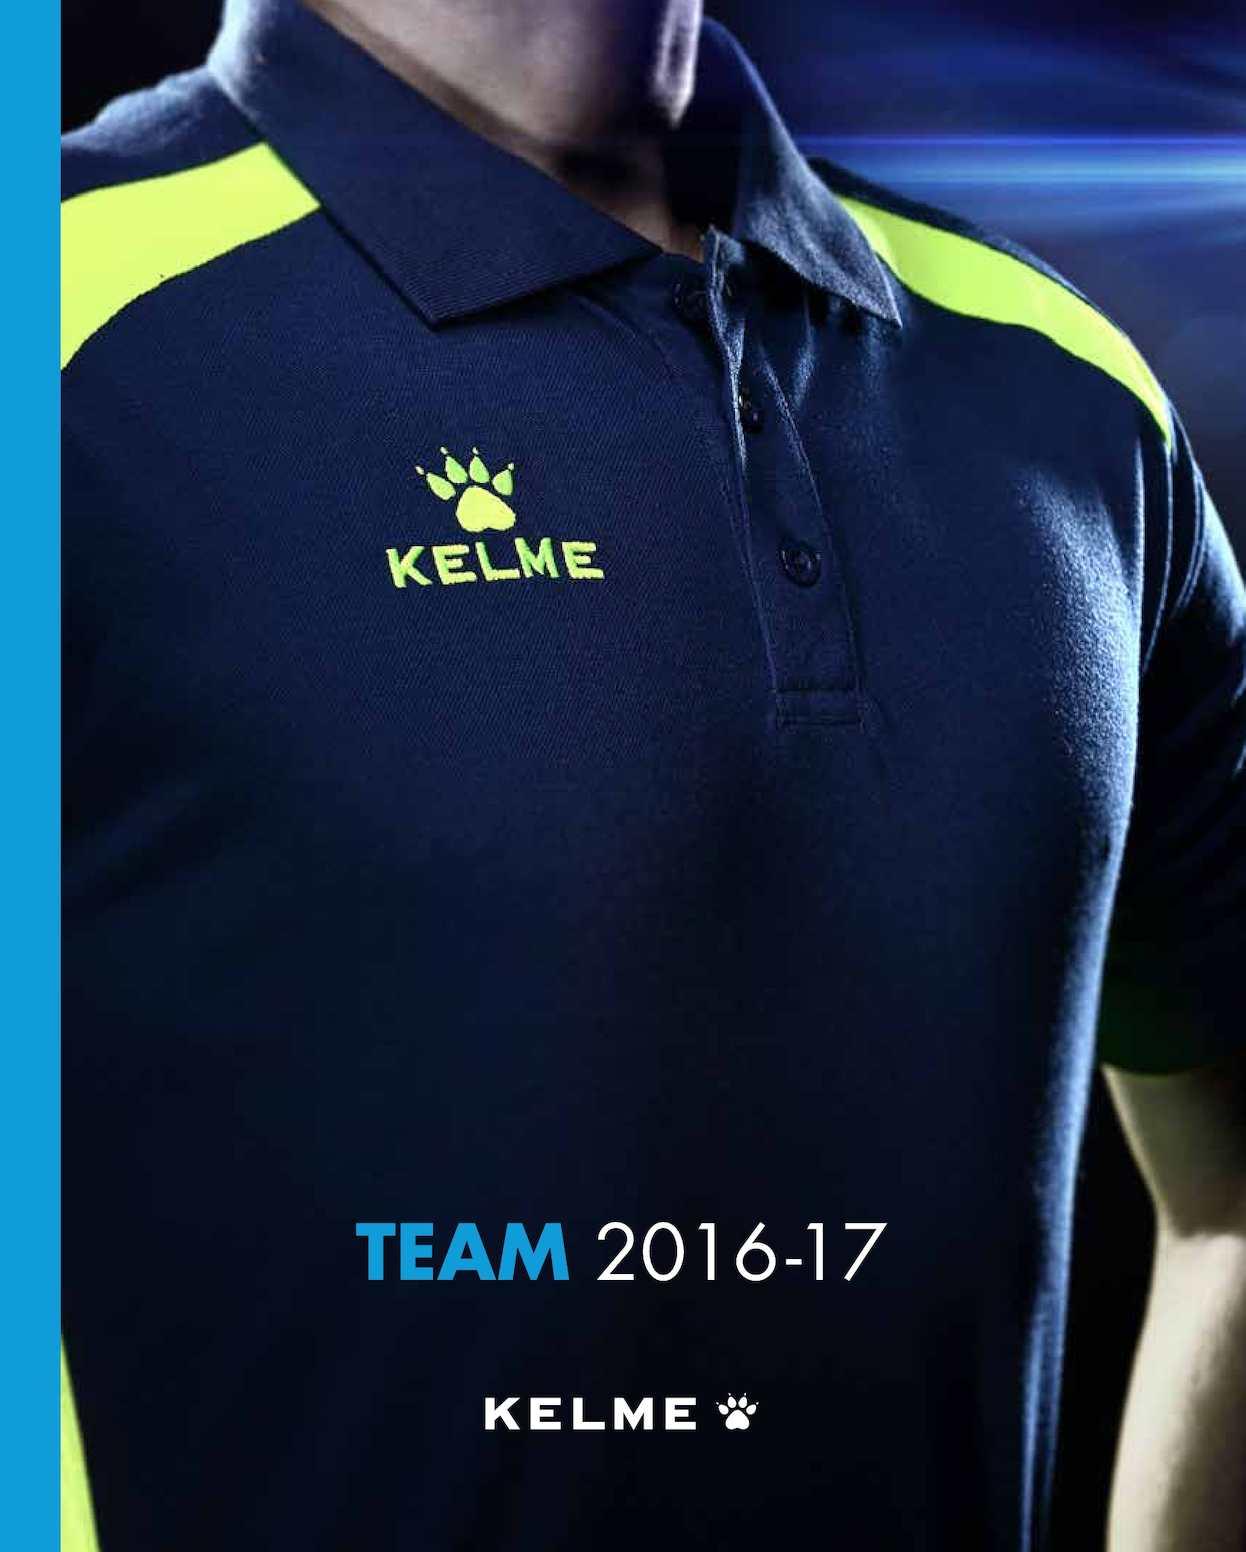 Calaméo - Catalogo Kelme Team 2016-2017 446828b0176